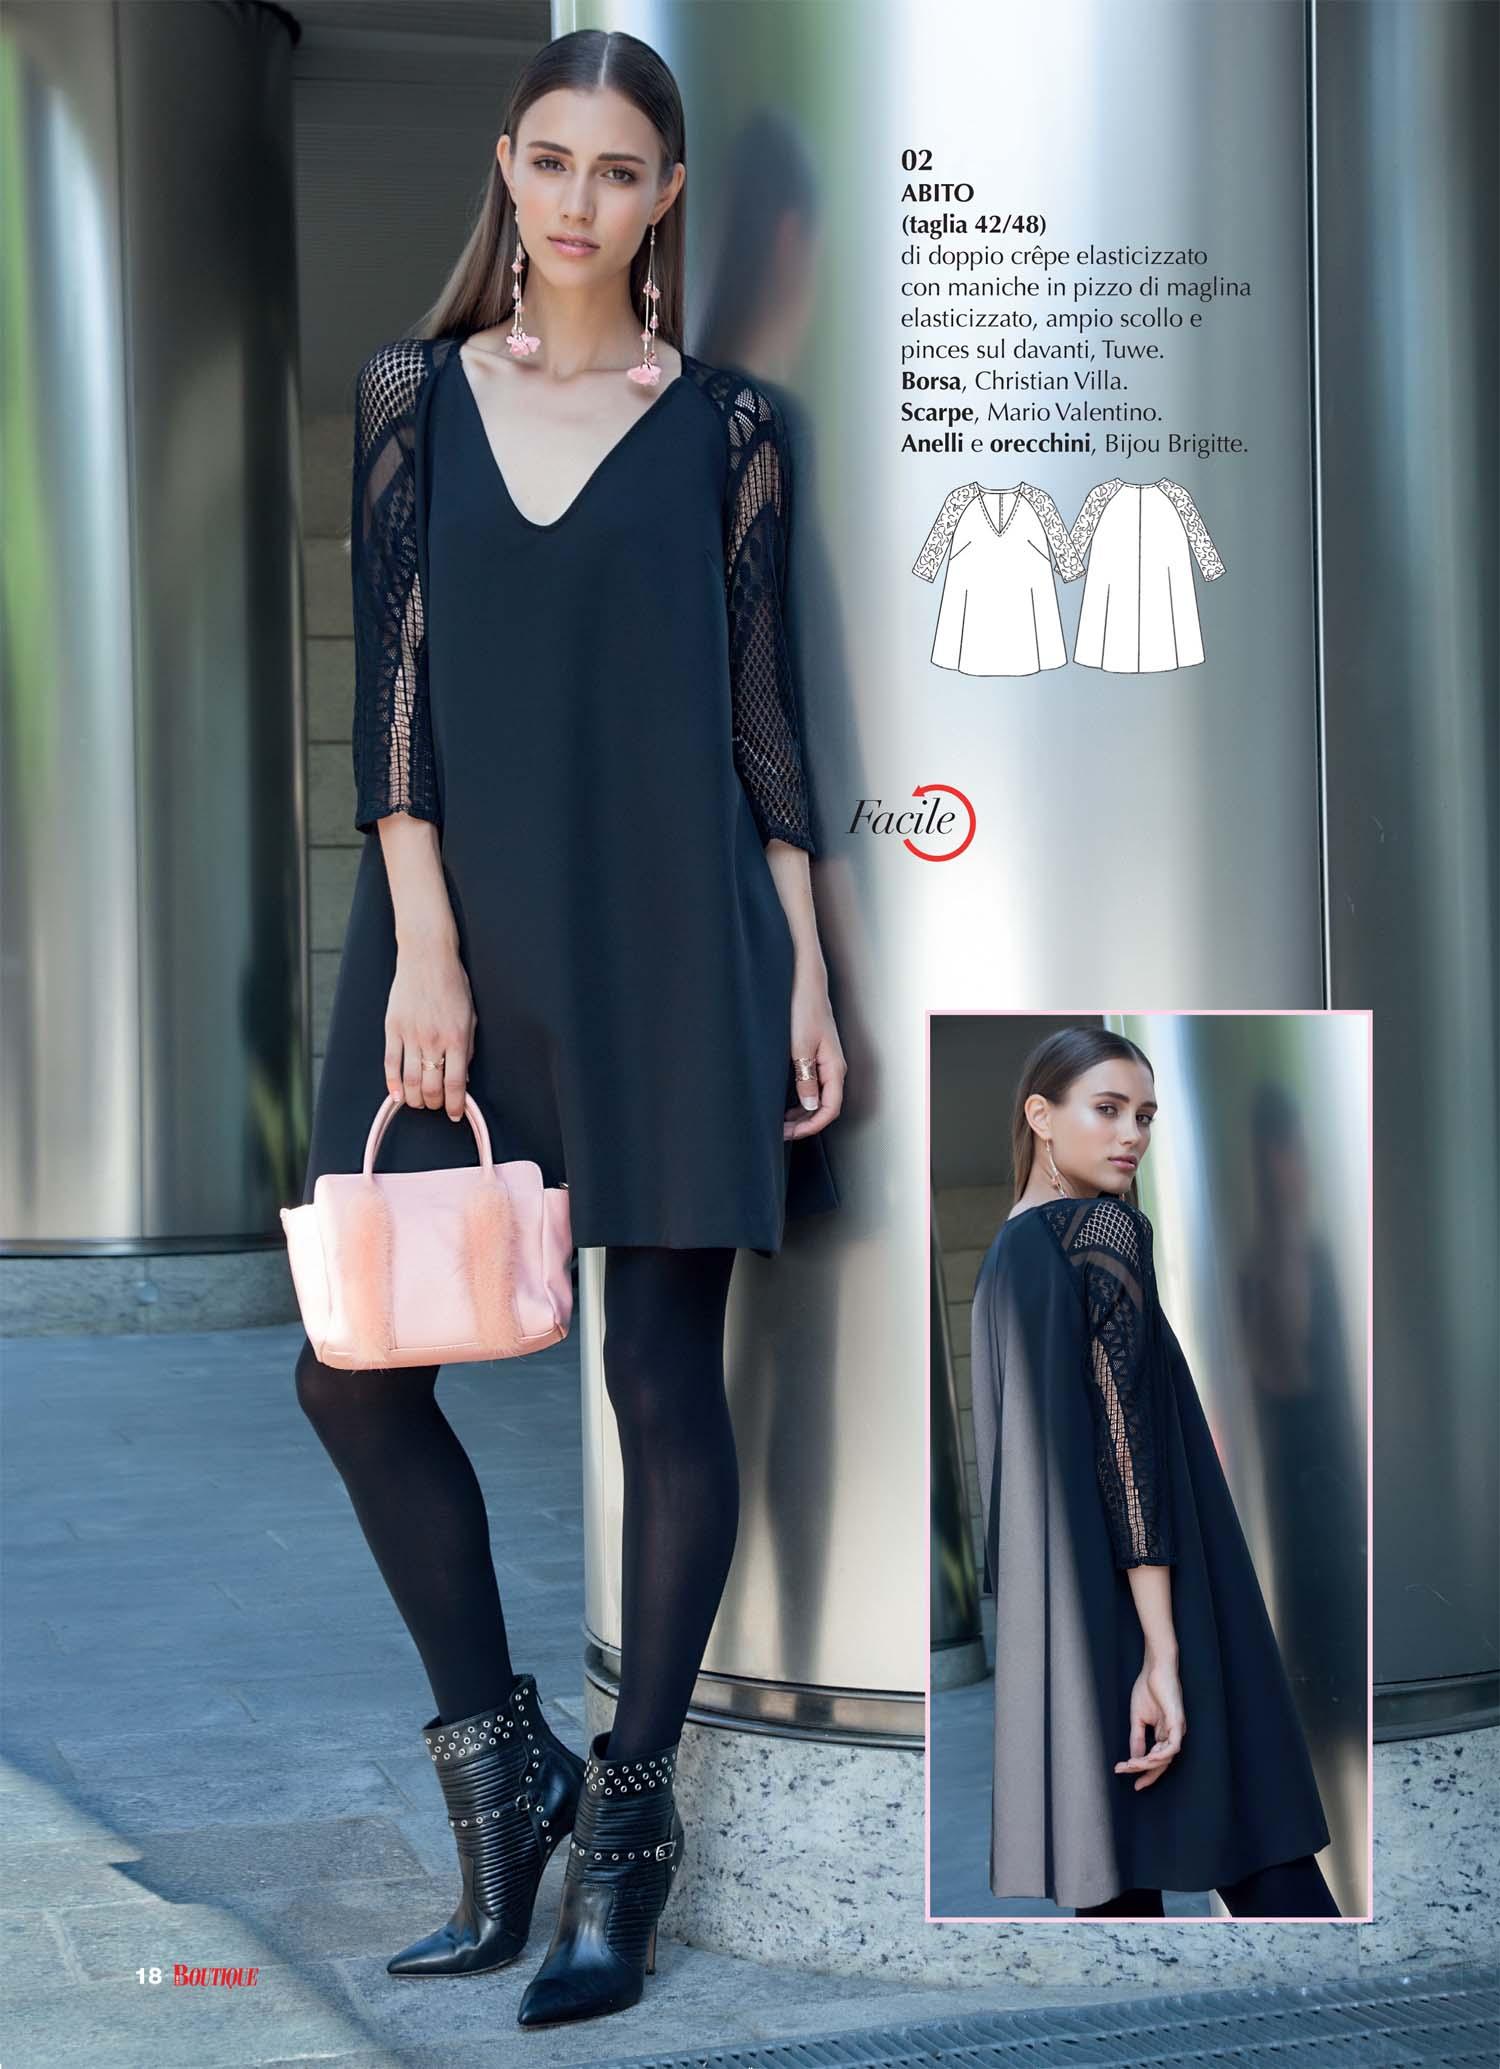 abito nero.jpg